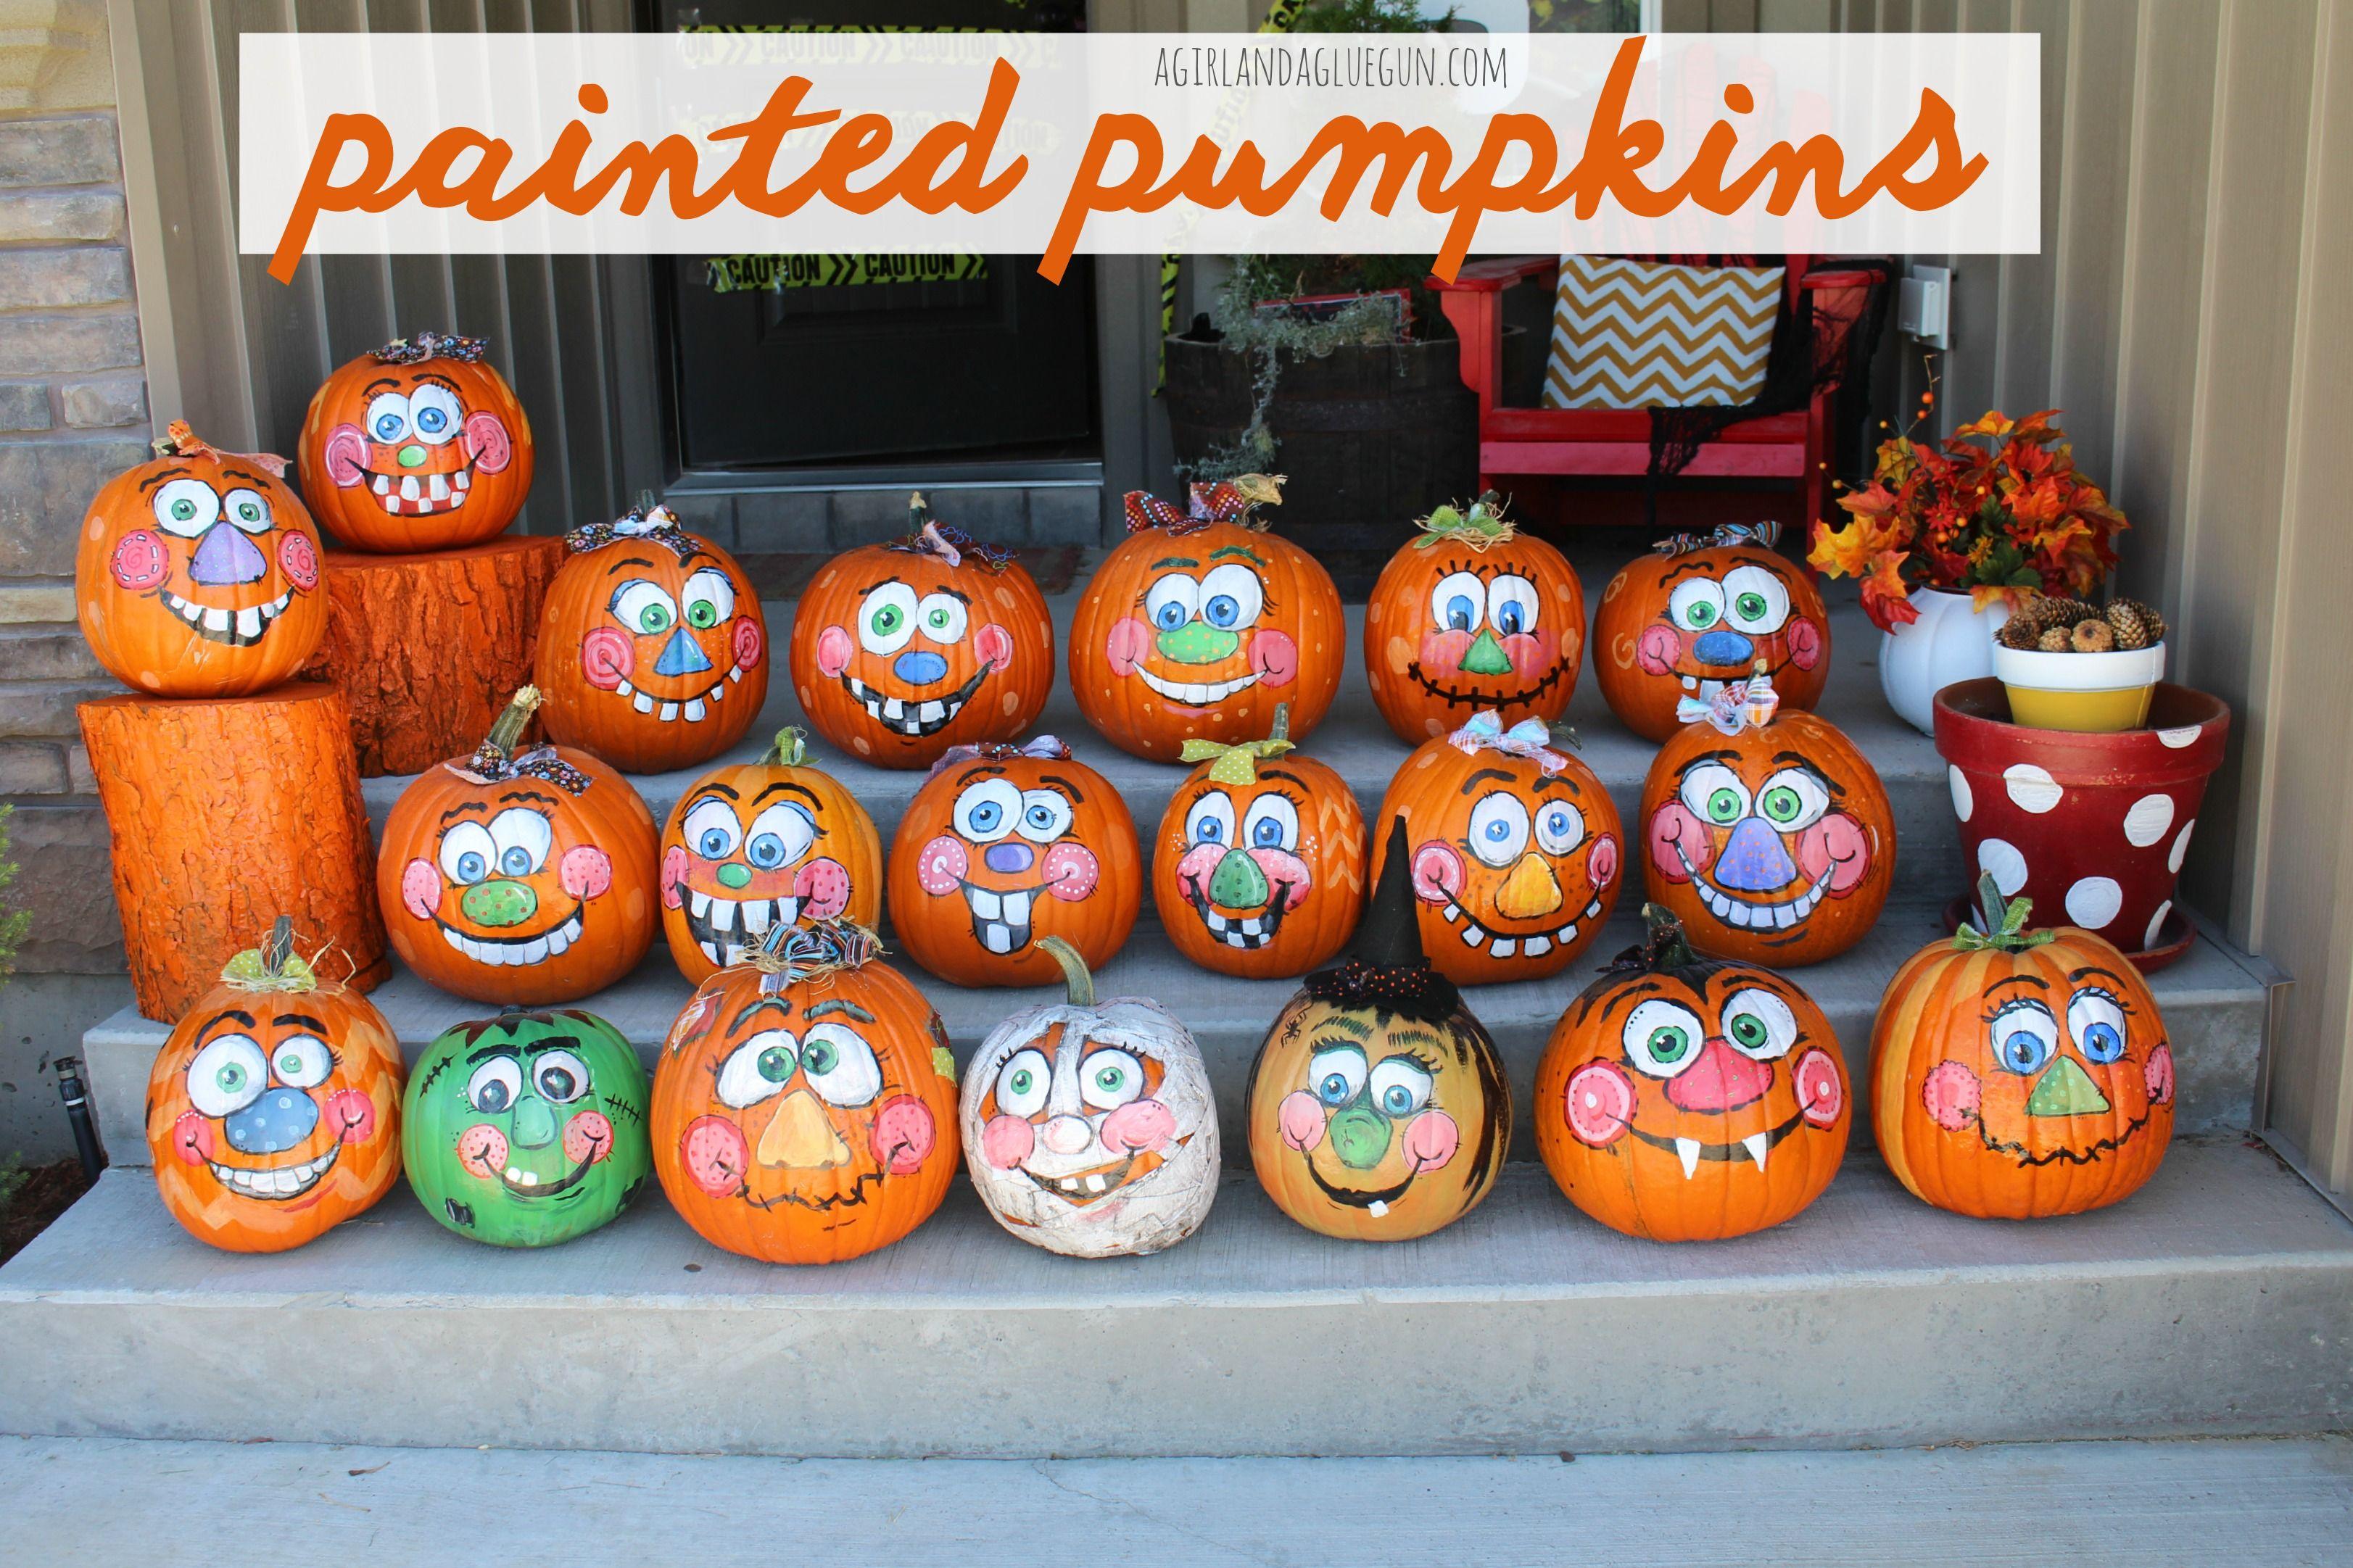 Small Pumpkin Painting Painted Pumpkins Goofy Face Pumpkin Ideas And Pumpkin Painting